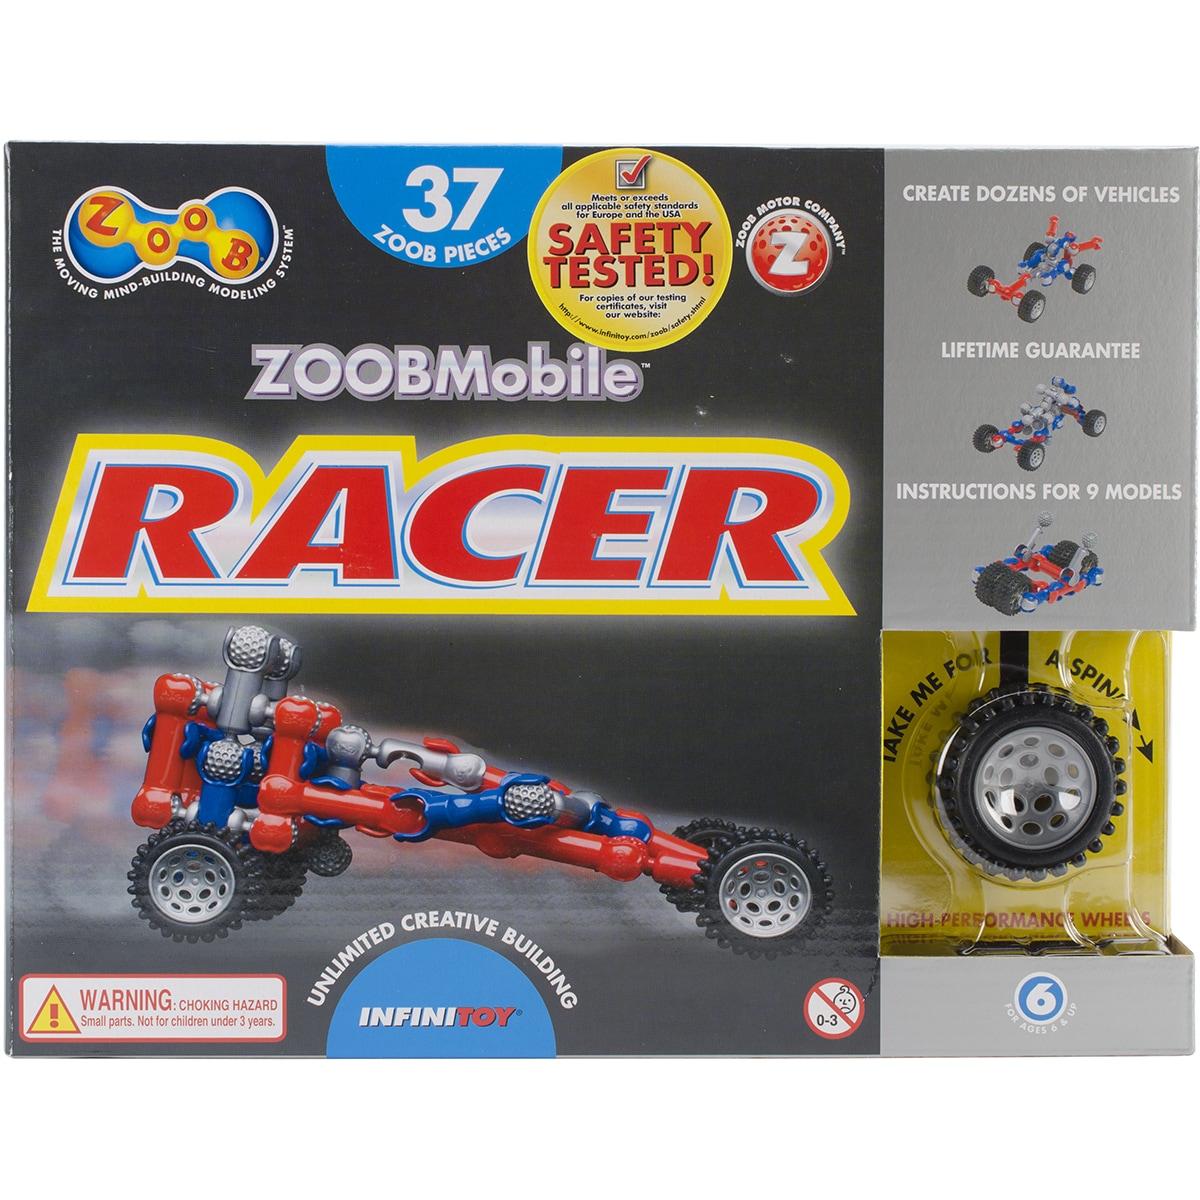 ZOOB Mobile Racer